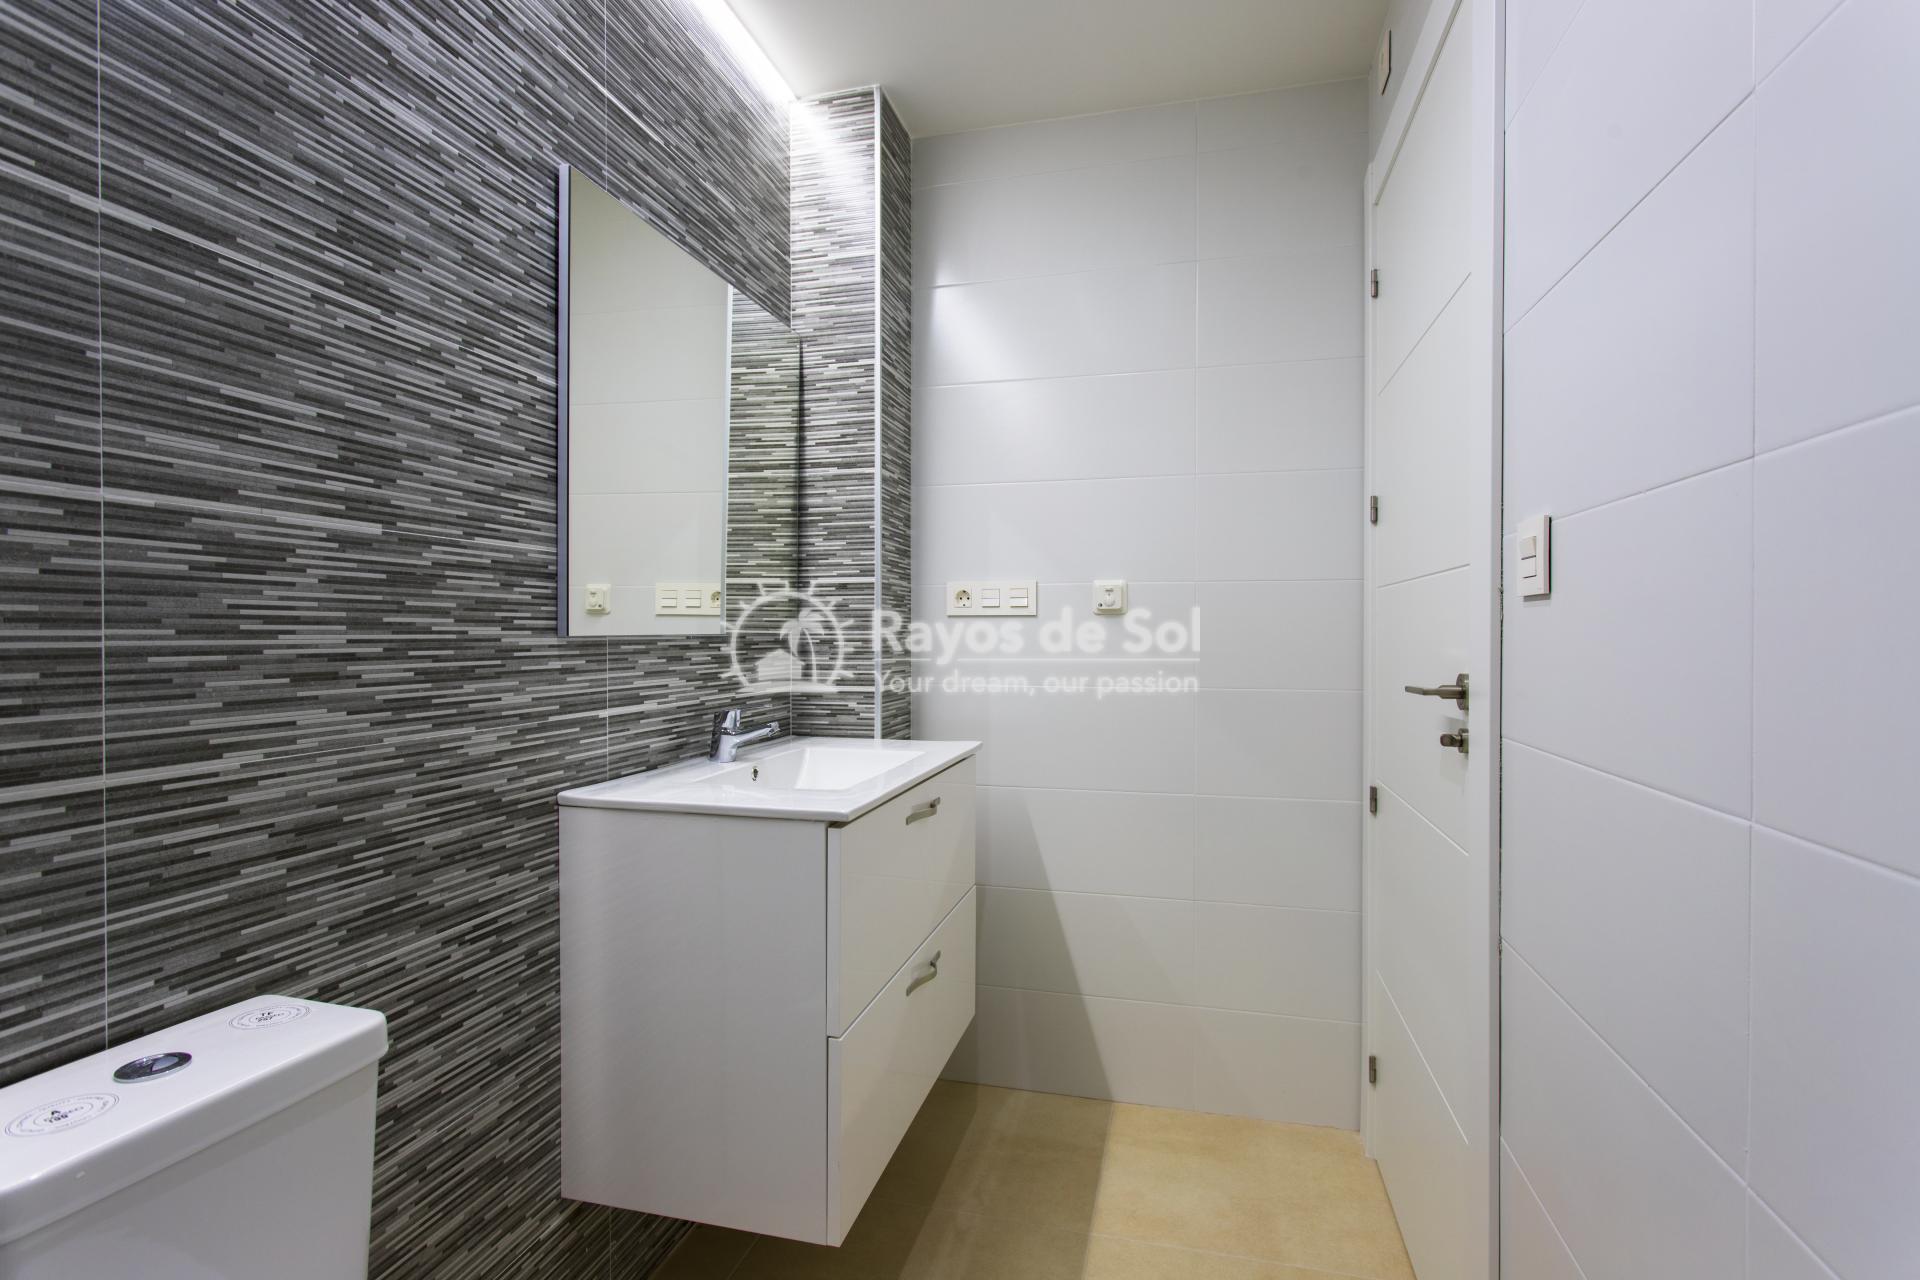 Appartement begane grond  in La Florida, Orihuela Costa, Costa Blanca (Oasis place BG3-2) - 16